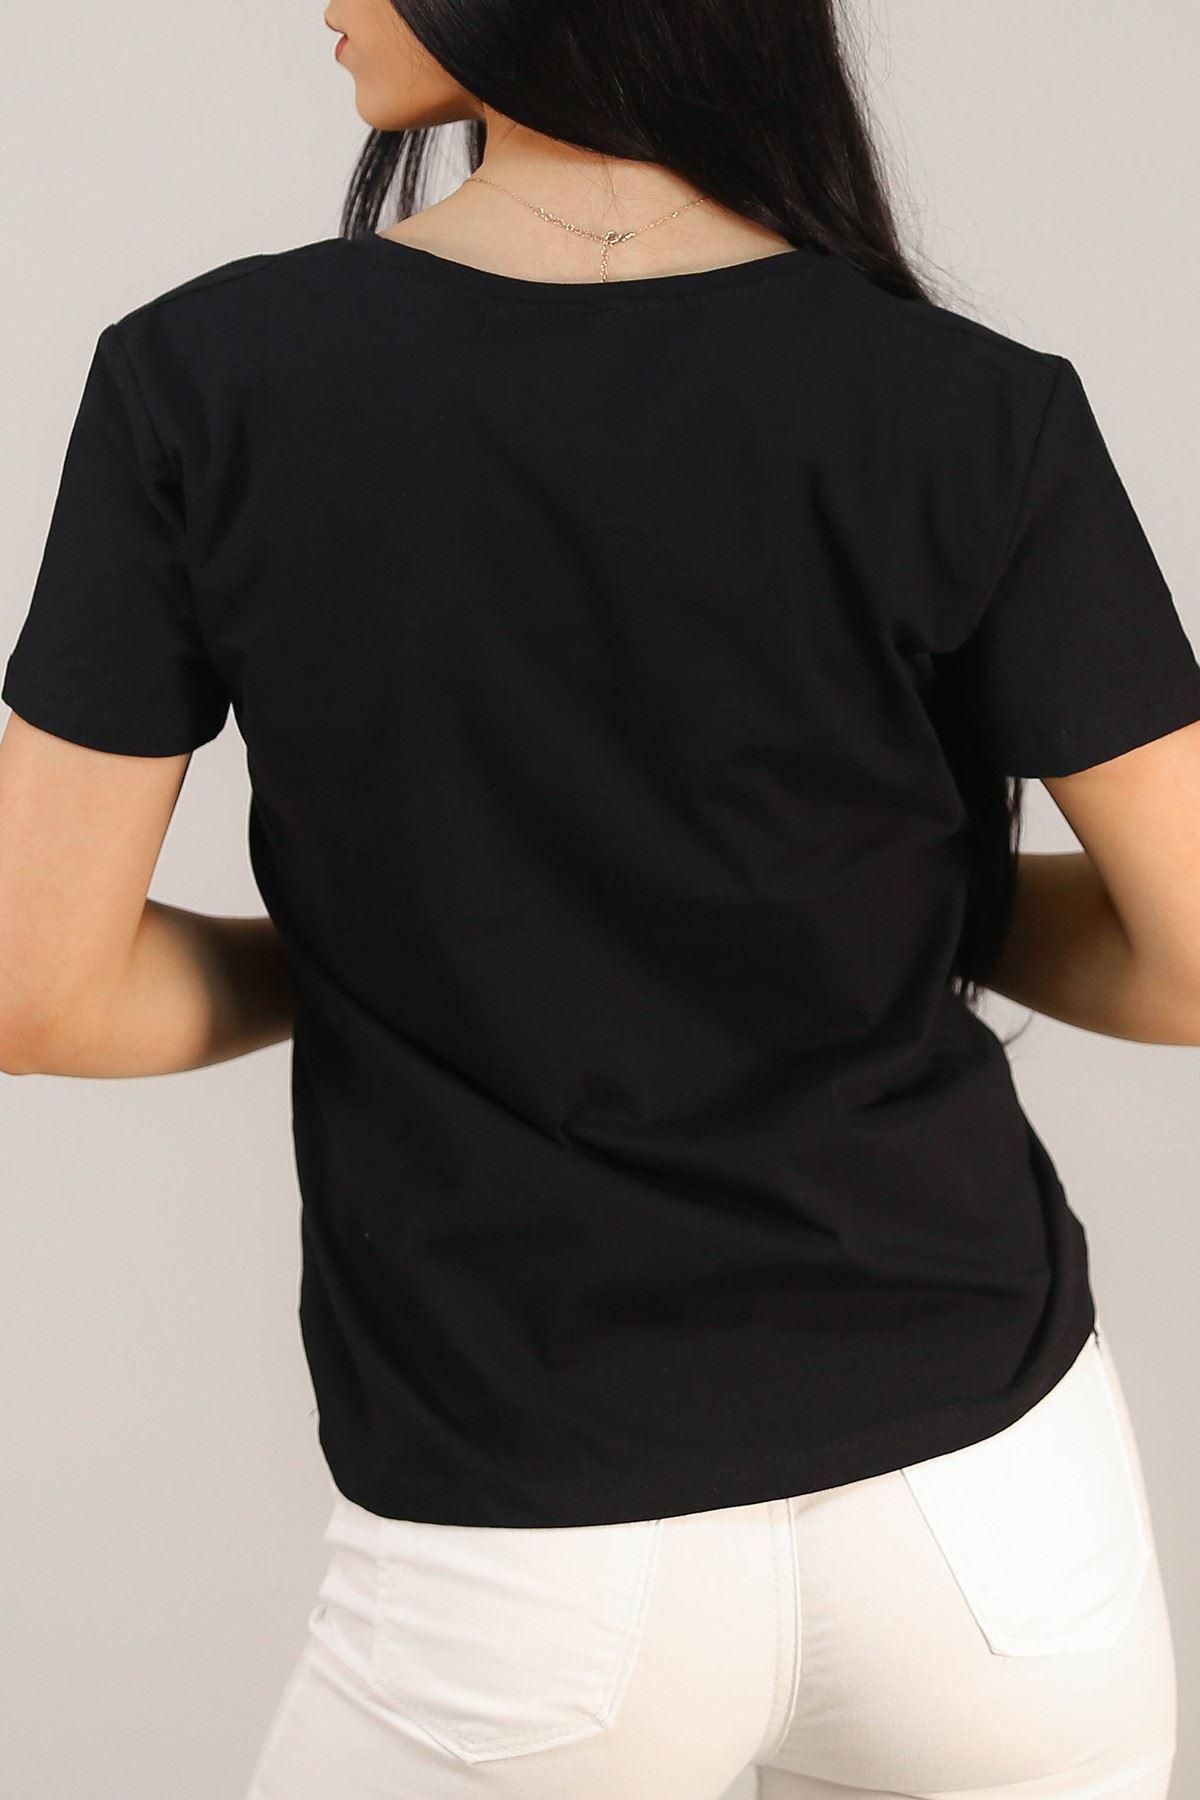 Nakışlı Tişört Siyah - 5001.336.